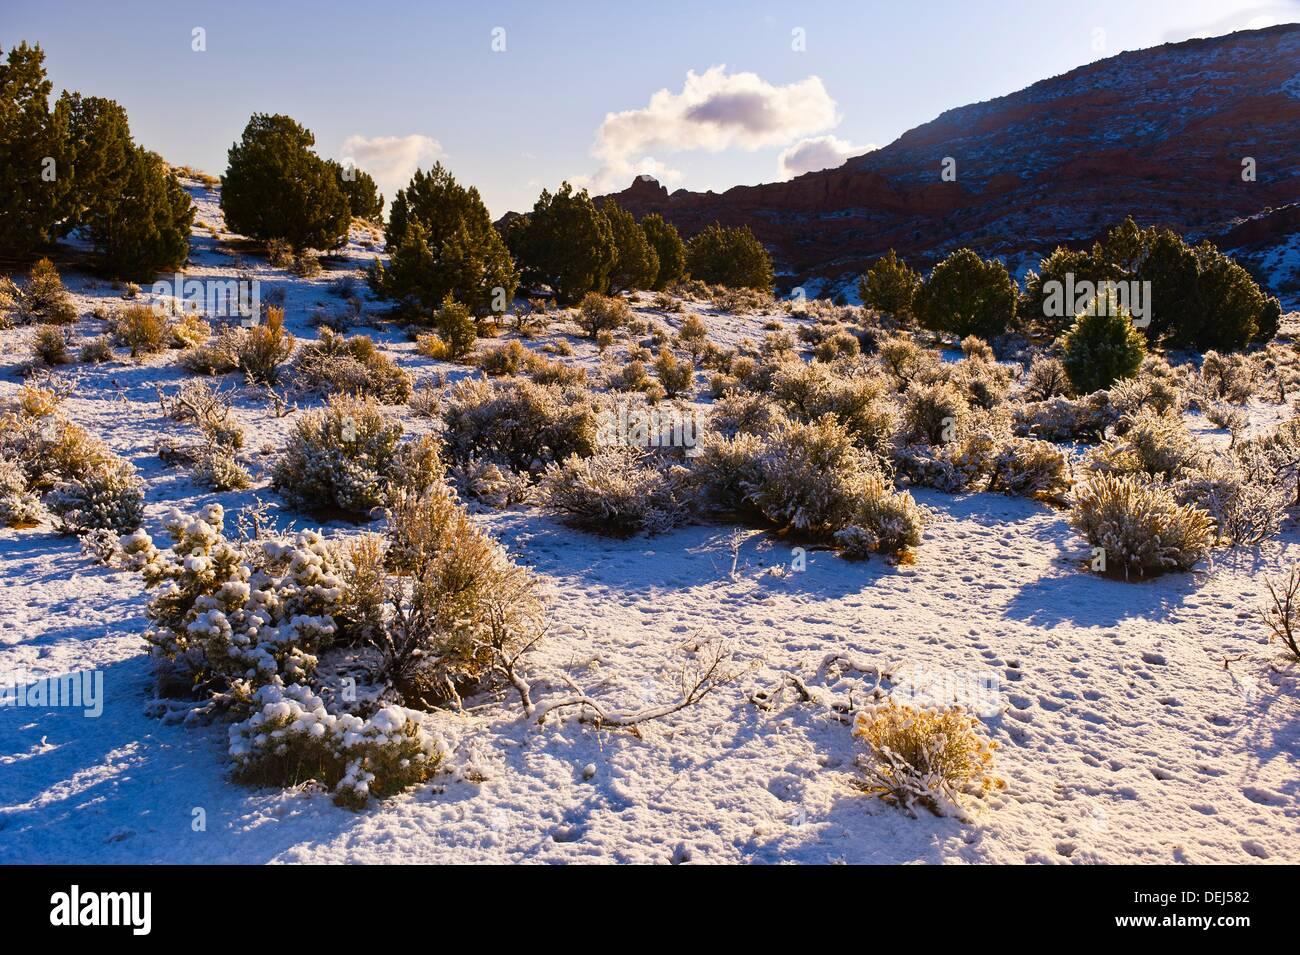 Stateline Campground, Vermillion Cliffs National Monument, Utah USA Stock Photo